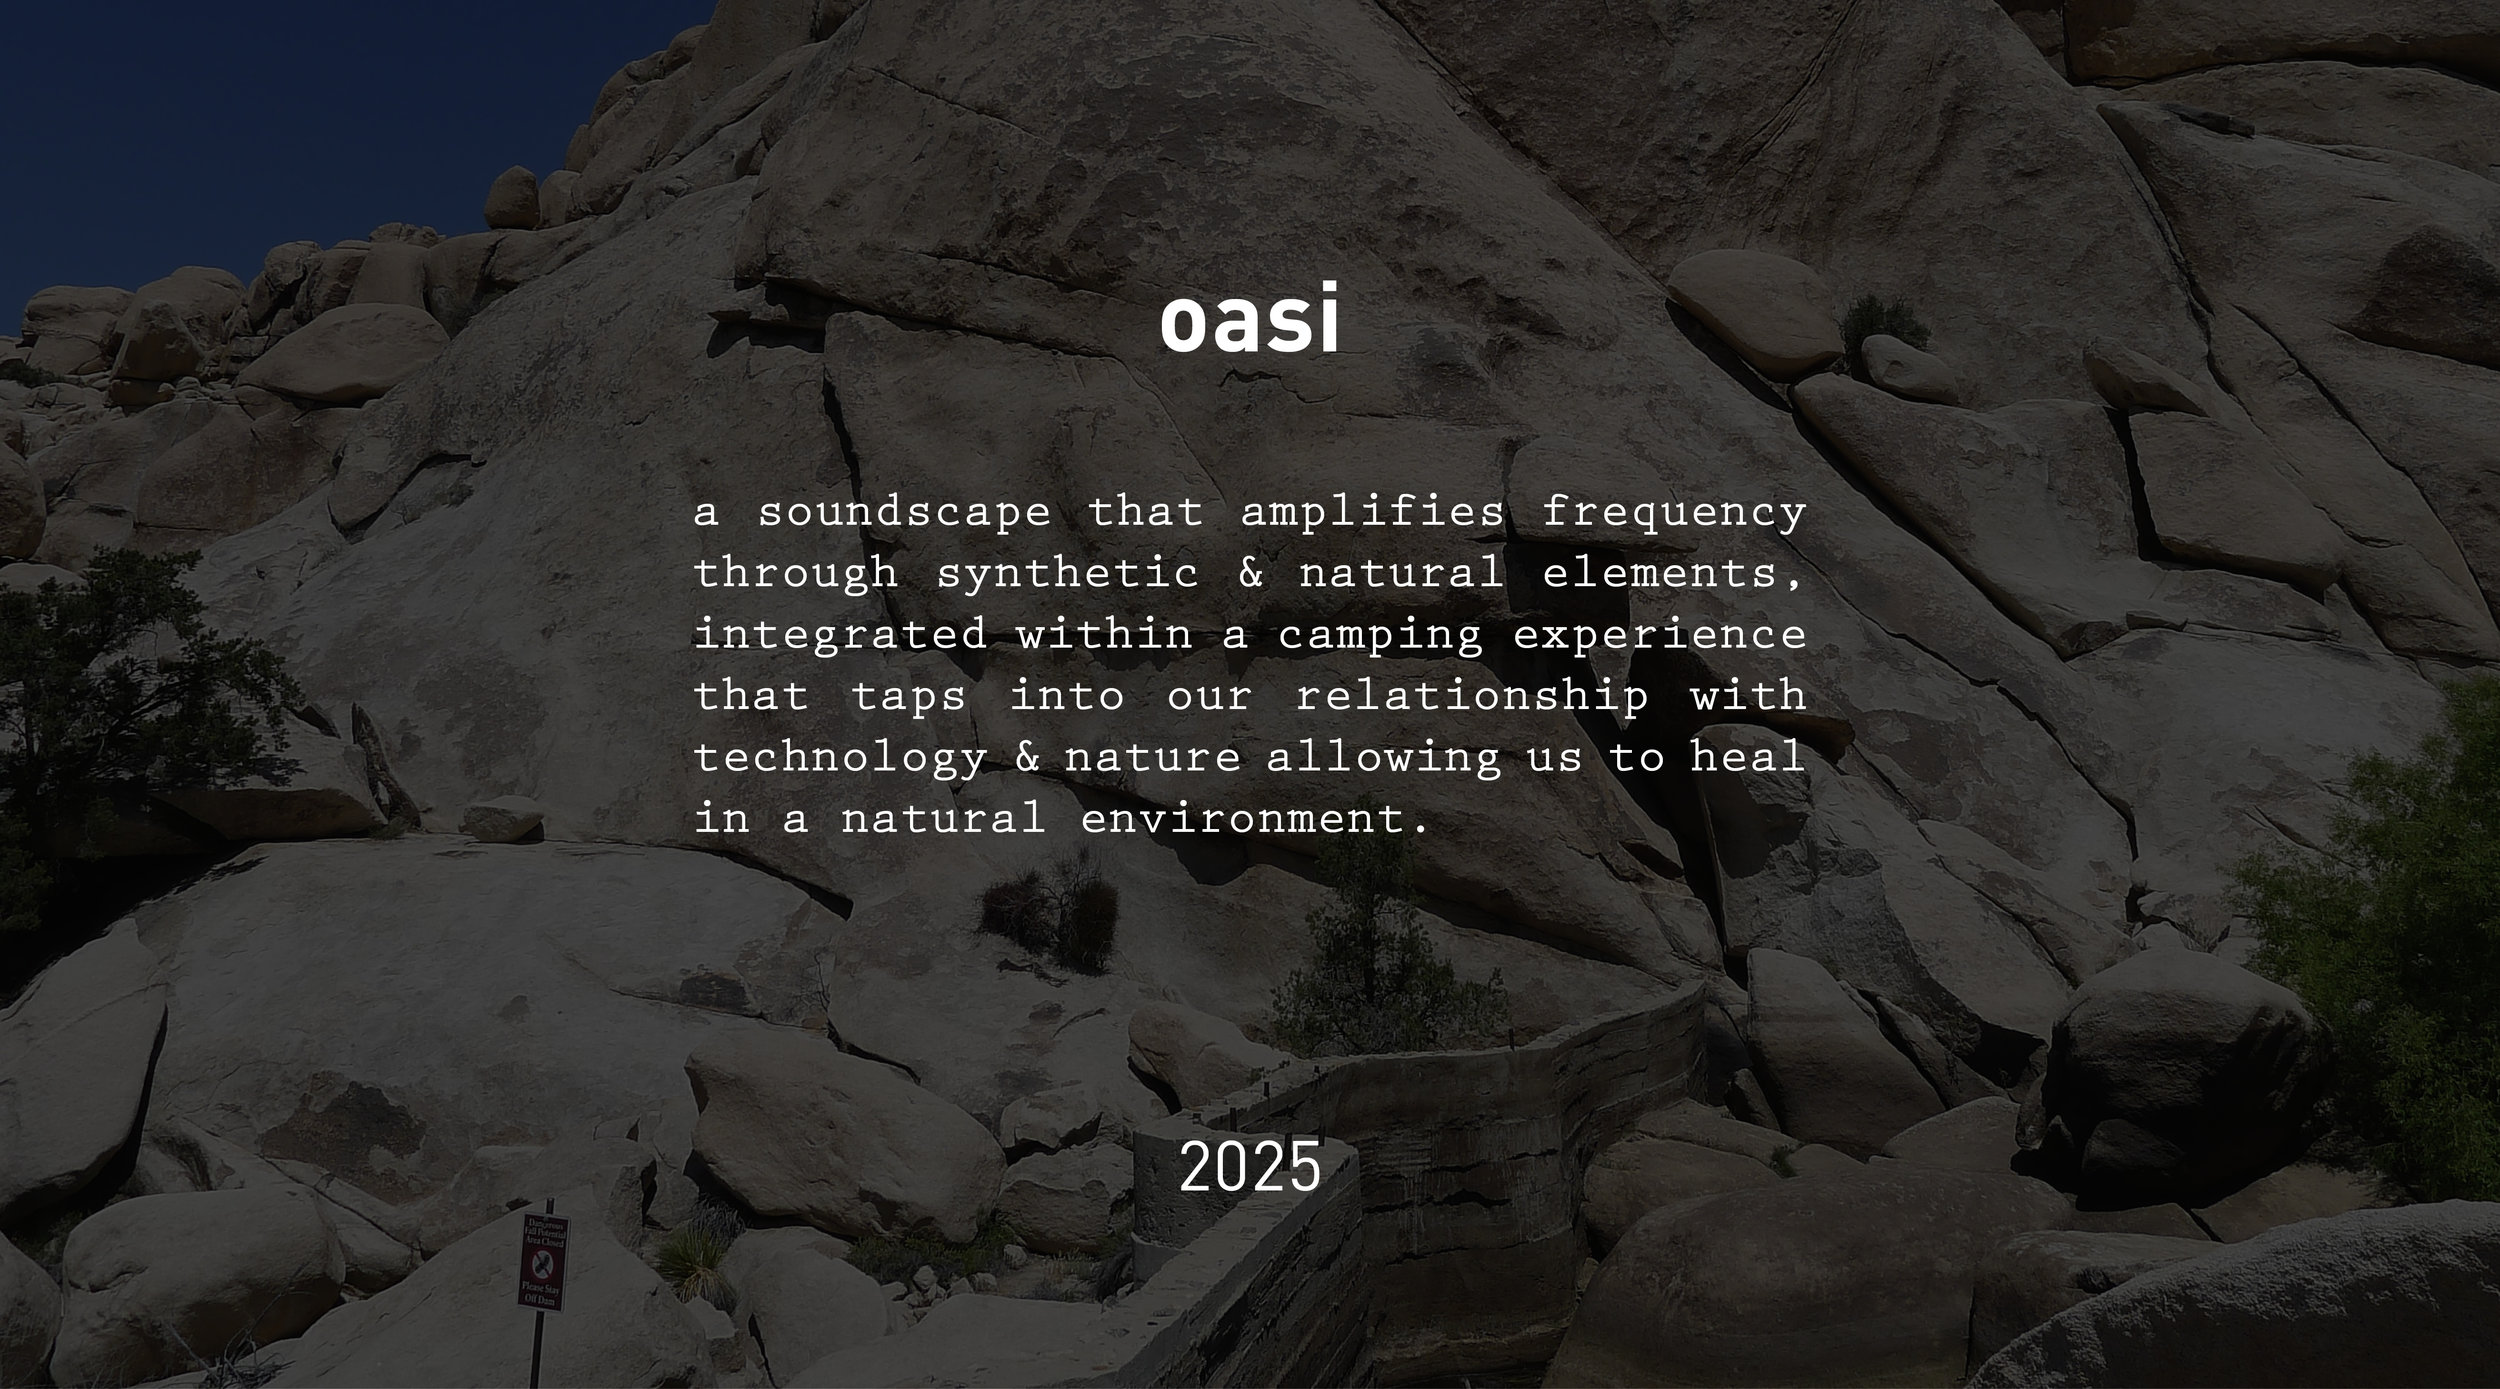 Oasi_Website.jpg